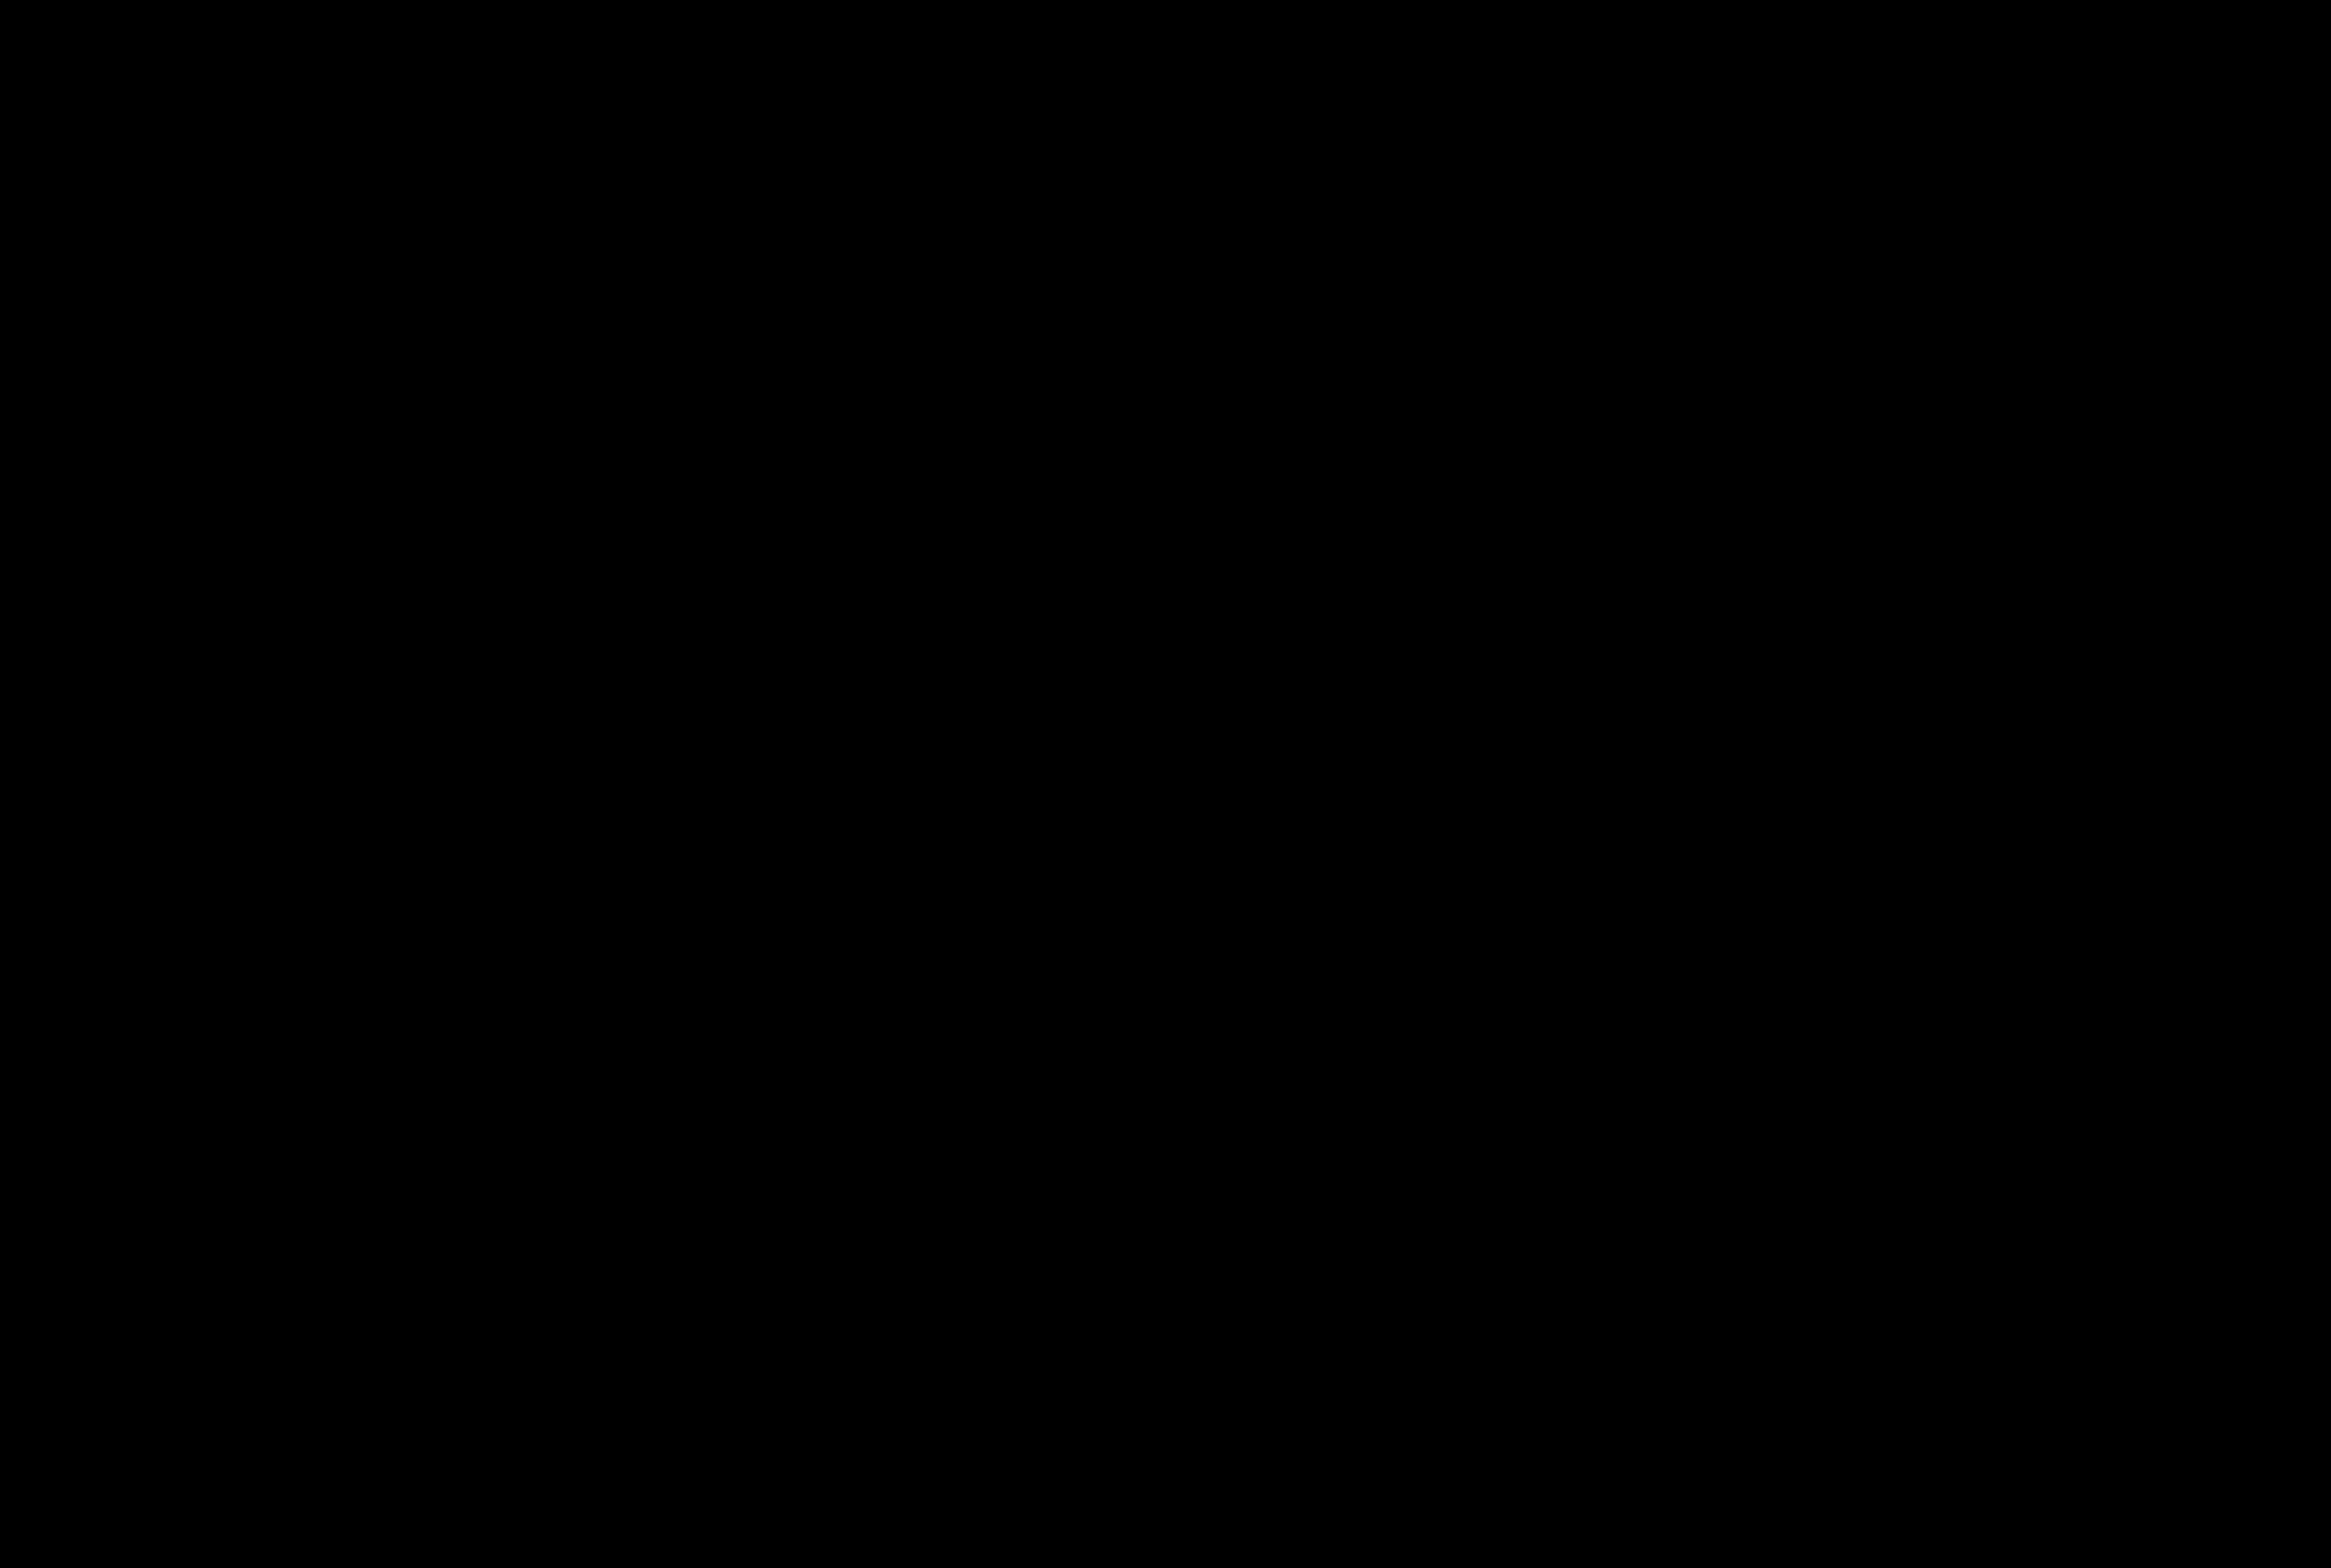 _2BP0605_A